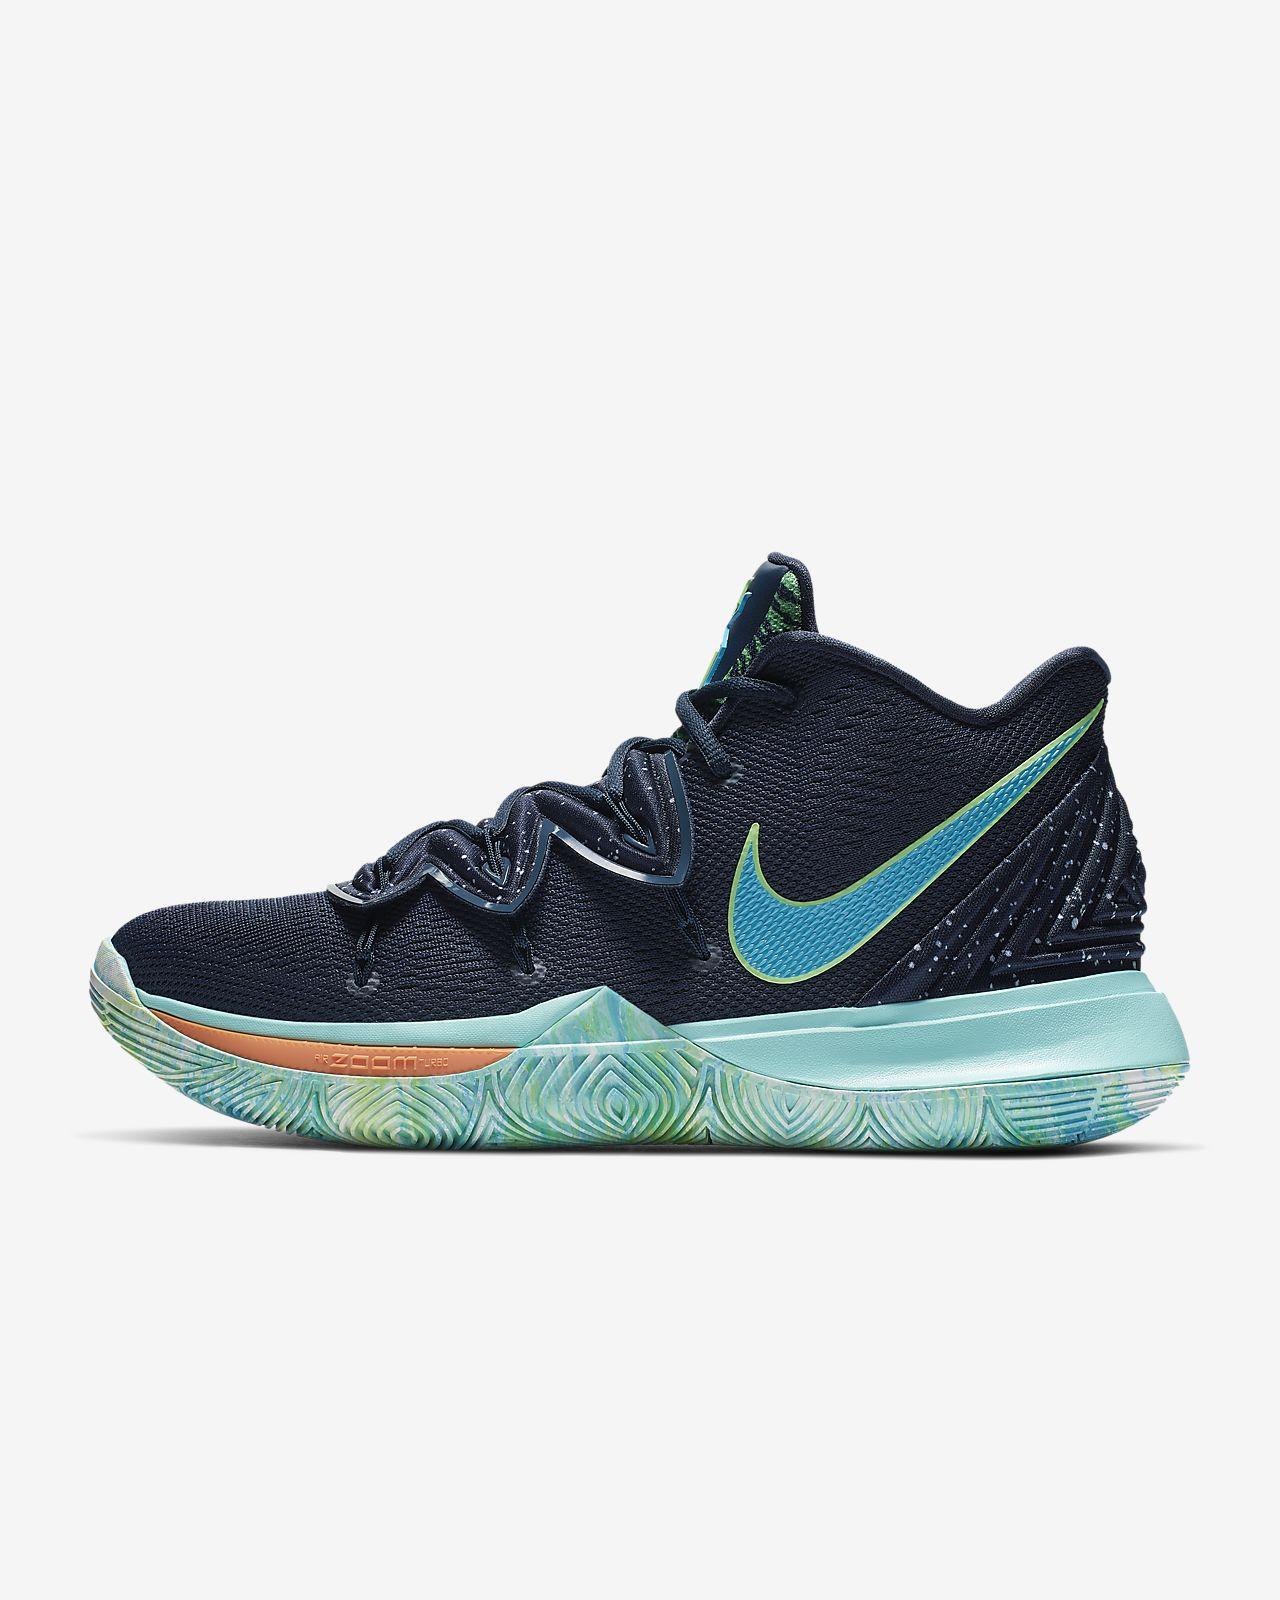 various colors b12ab 43d19 ... Chaussure de basketball Kyrie 5